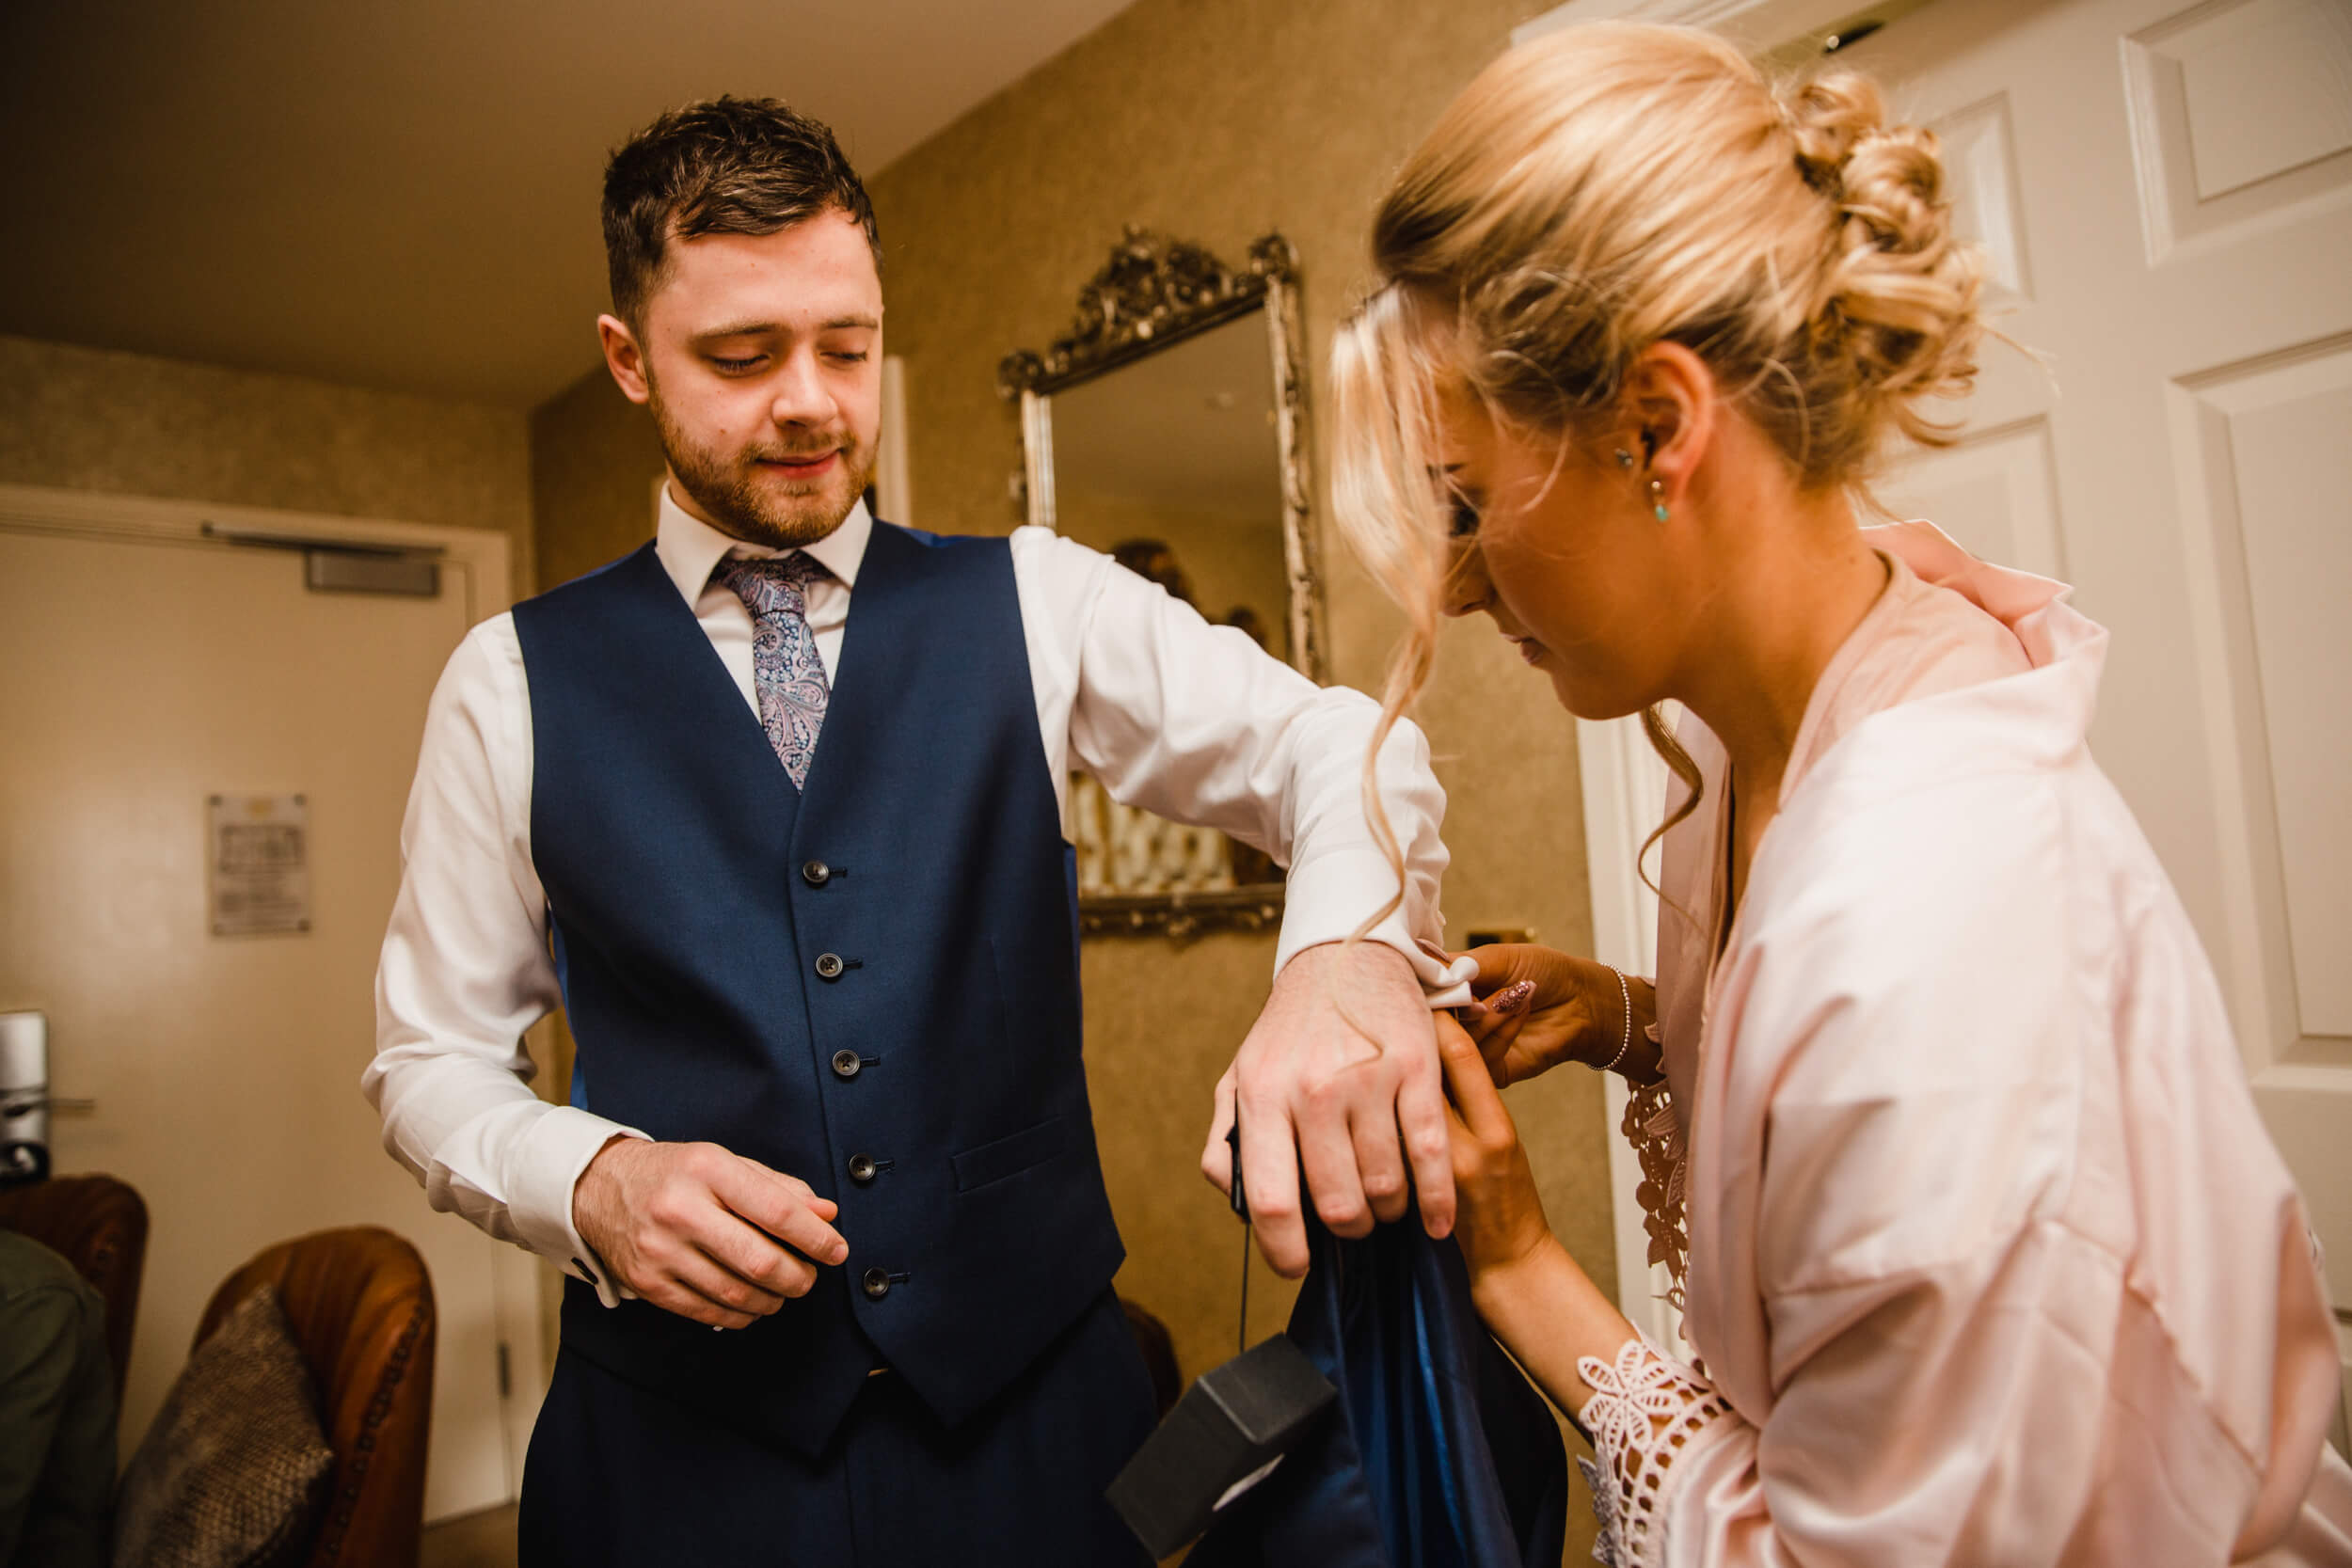 30_James_Street_Hotel_Wedding_Venue_008.jpg